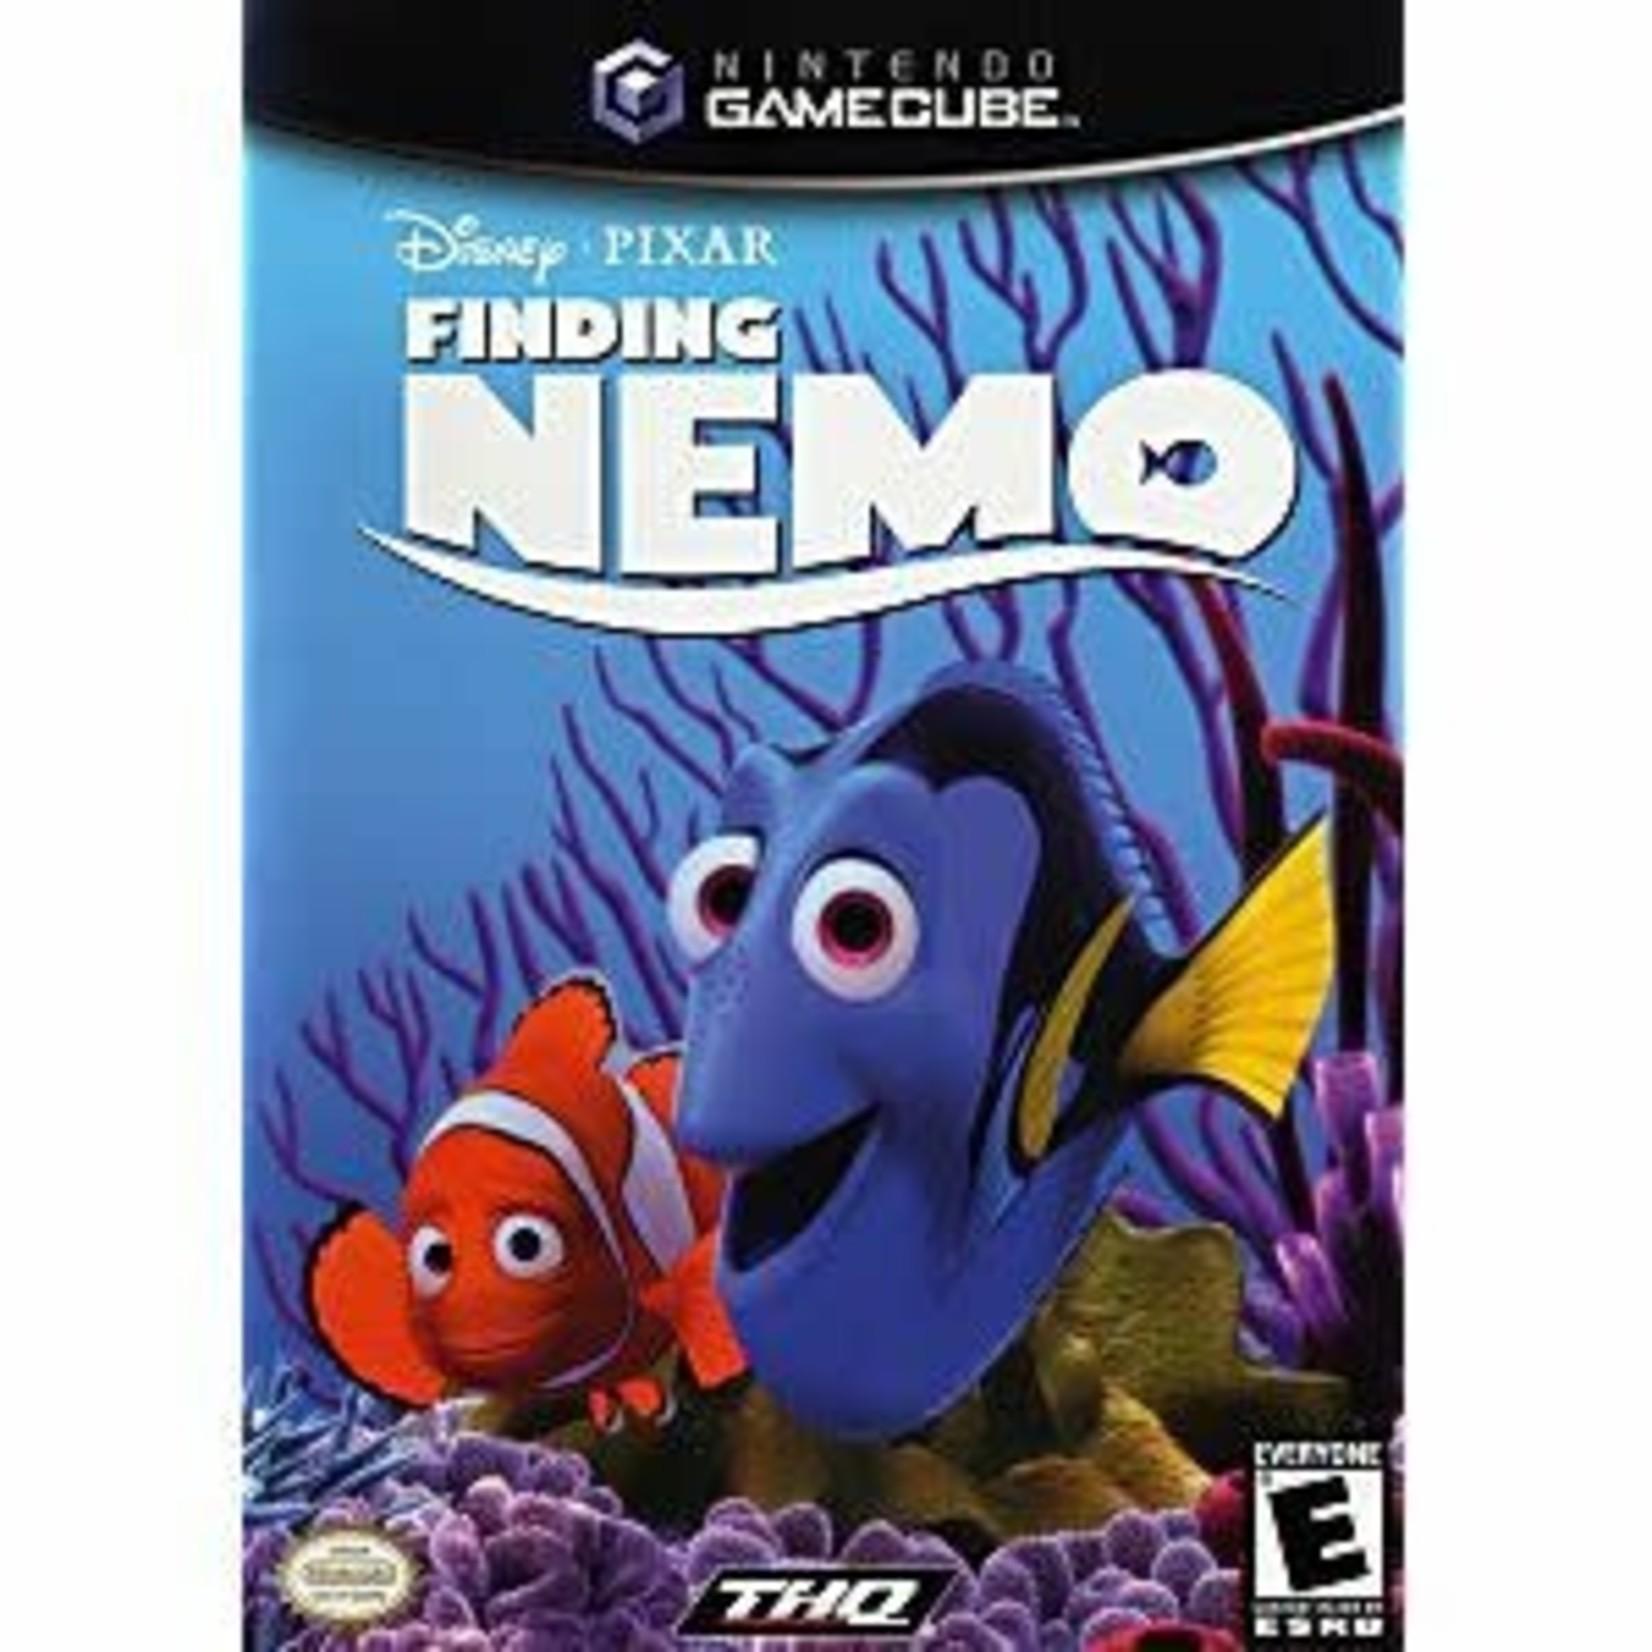 GCU-FINDING NEMO